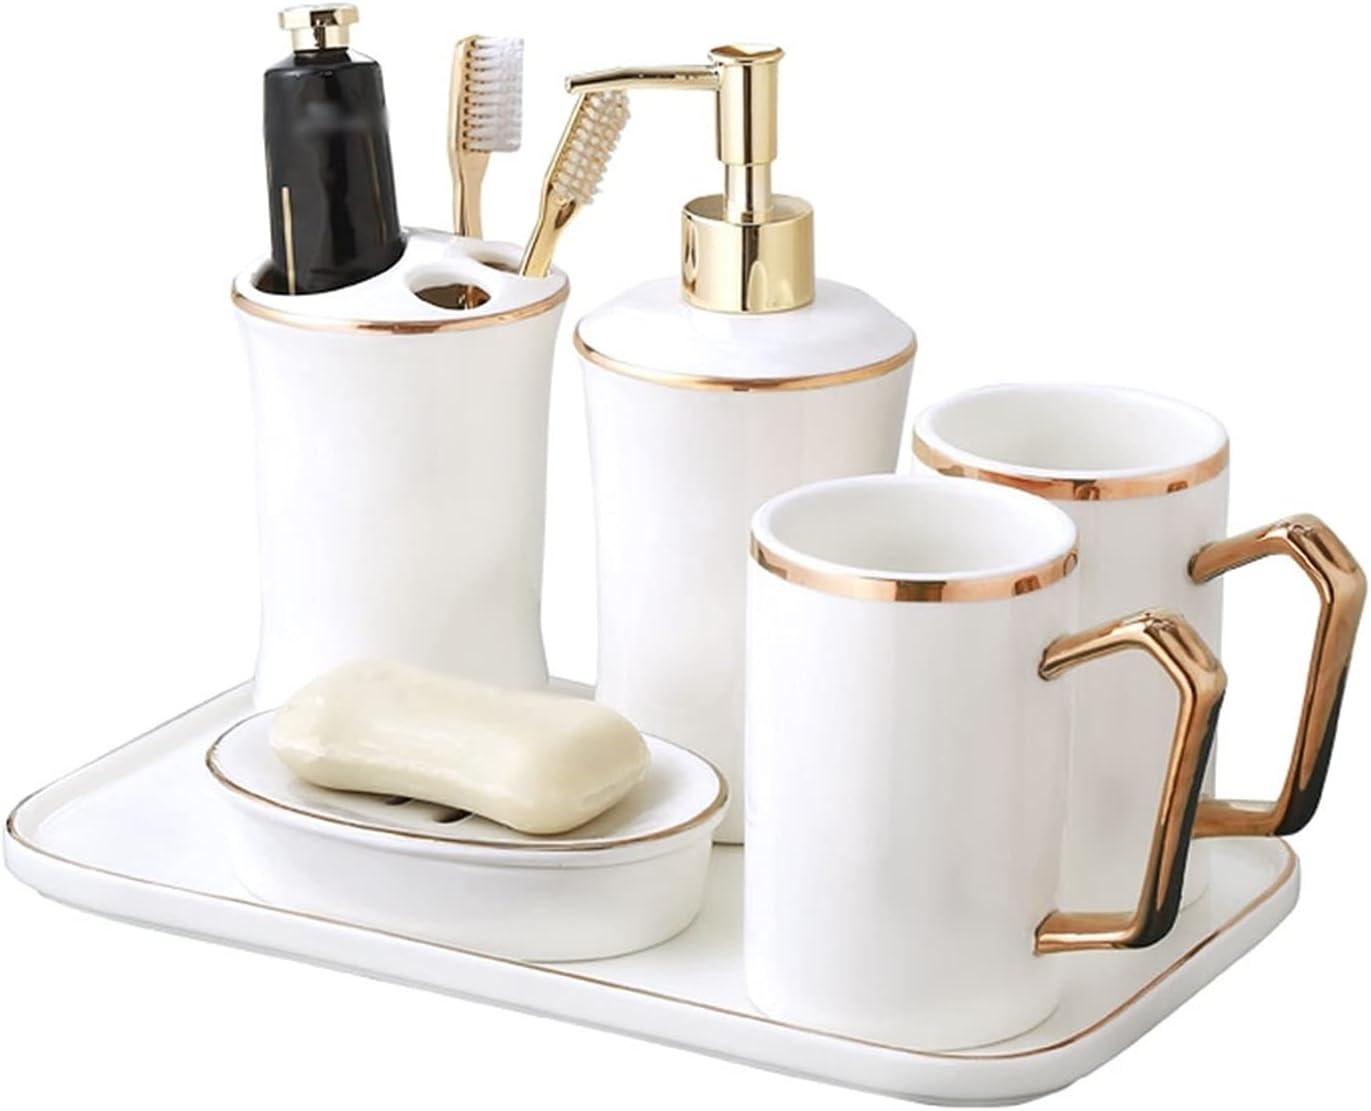 Soap Dispenser Bottle half 1 year warranty Lotion Set Bathroom Accessories